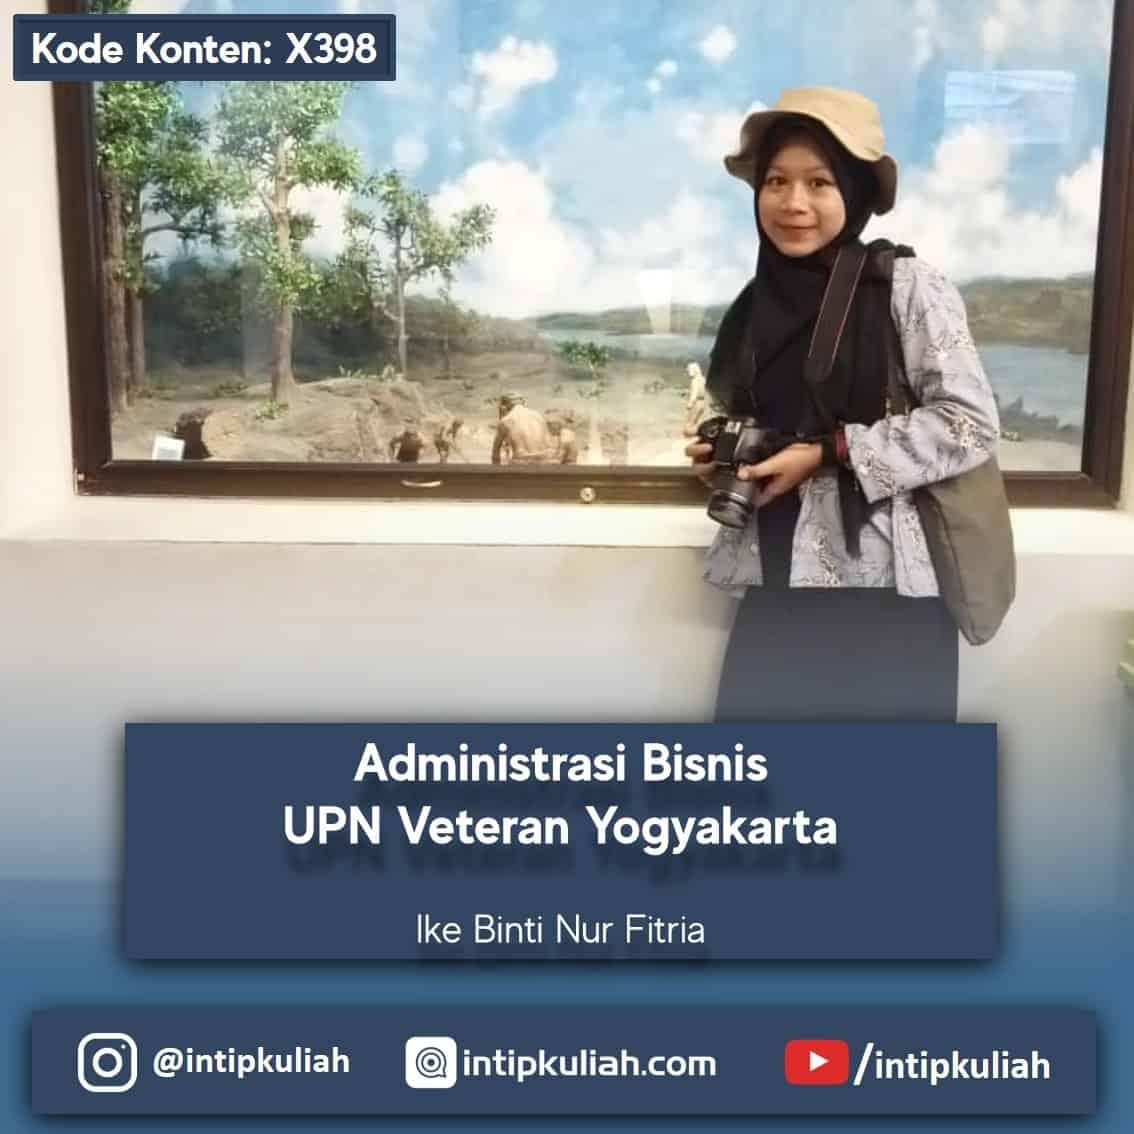 Administrasi Bisnis UPN Veteran Yogyakarta (Ike)